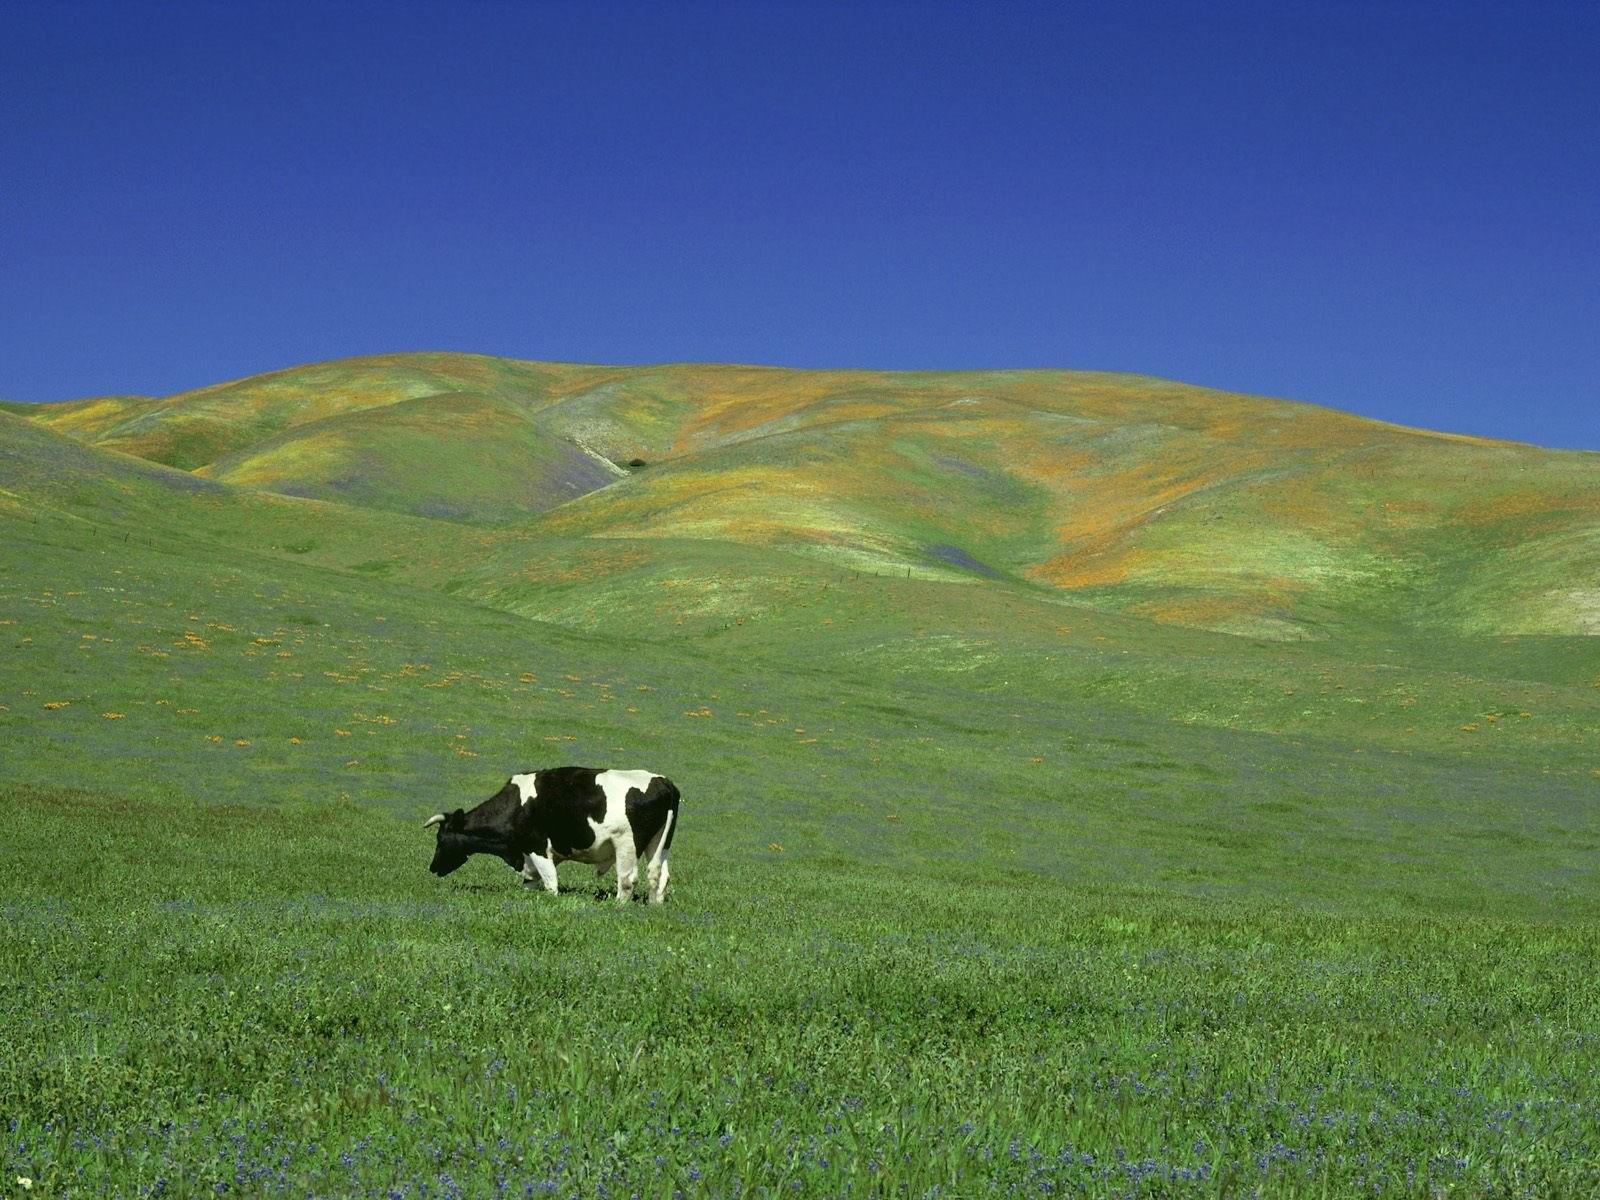 Корова на лугу. Обои с животными, картинки, фото 1600x1200